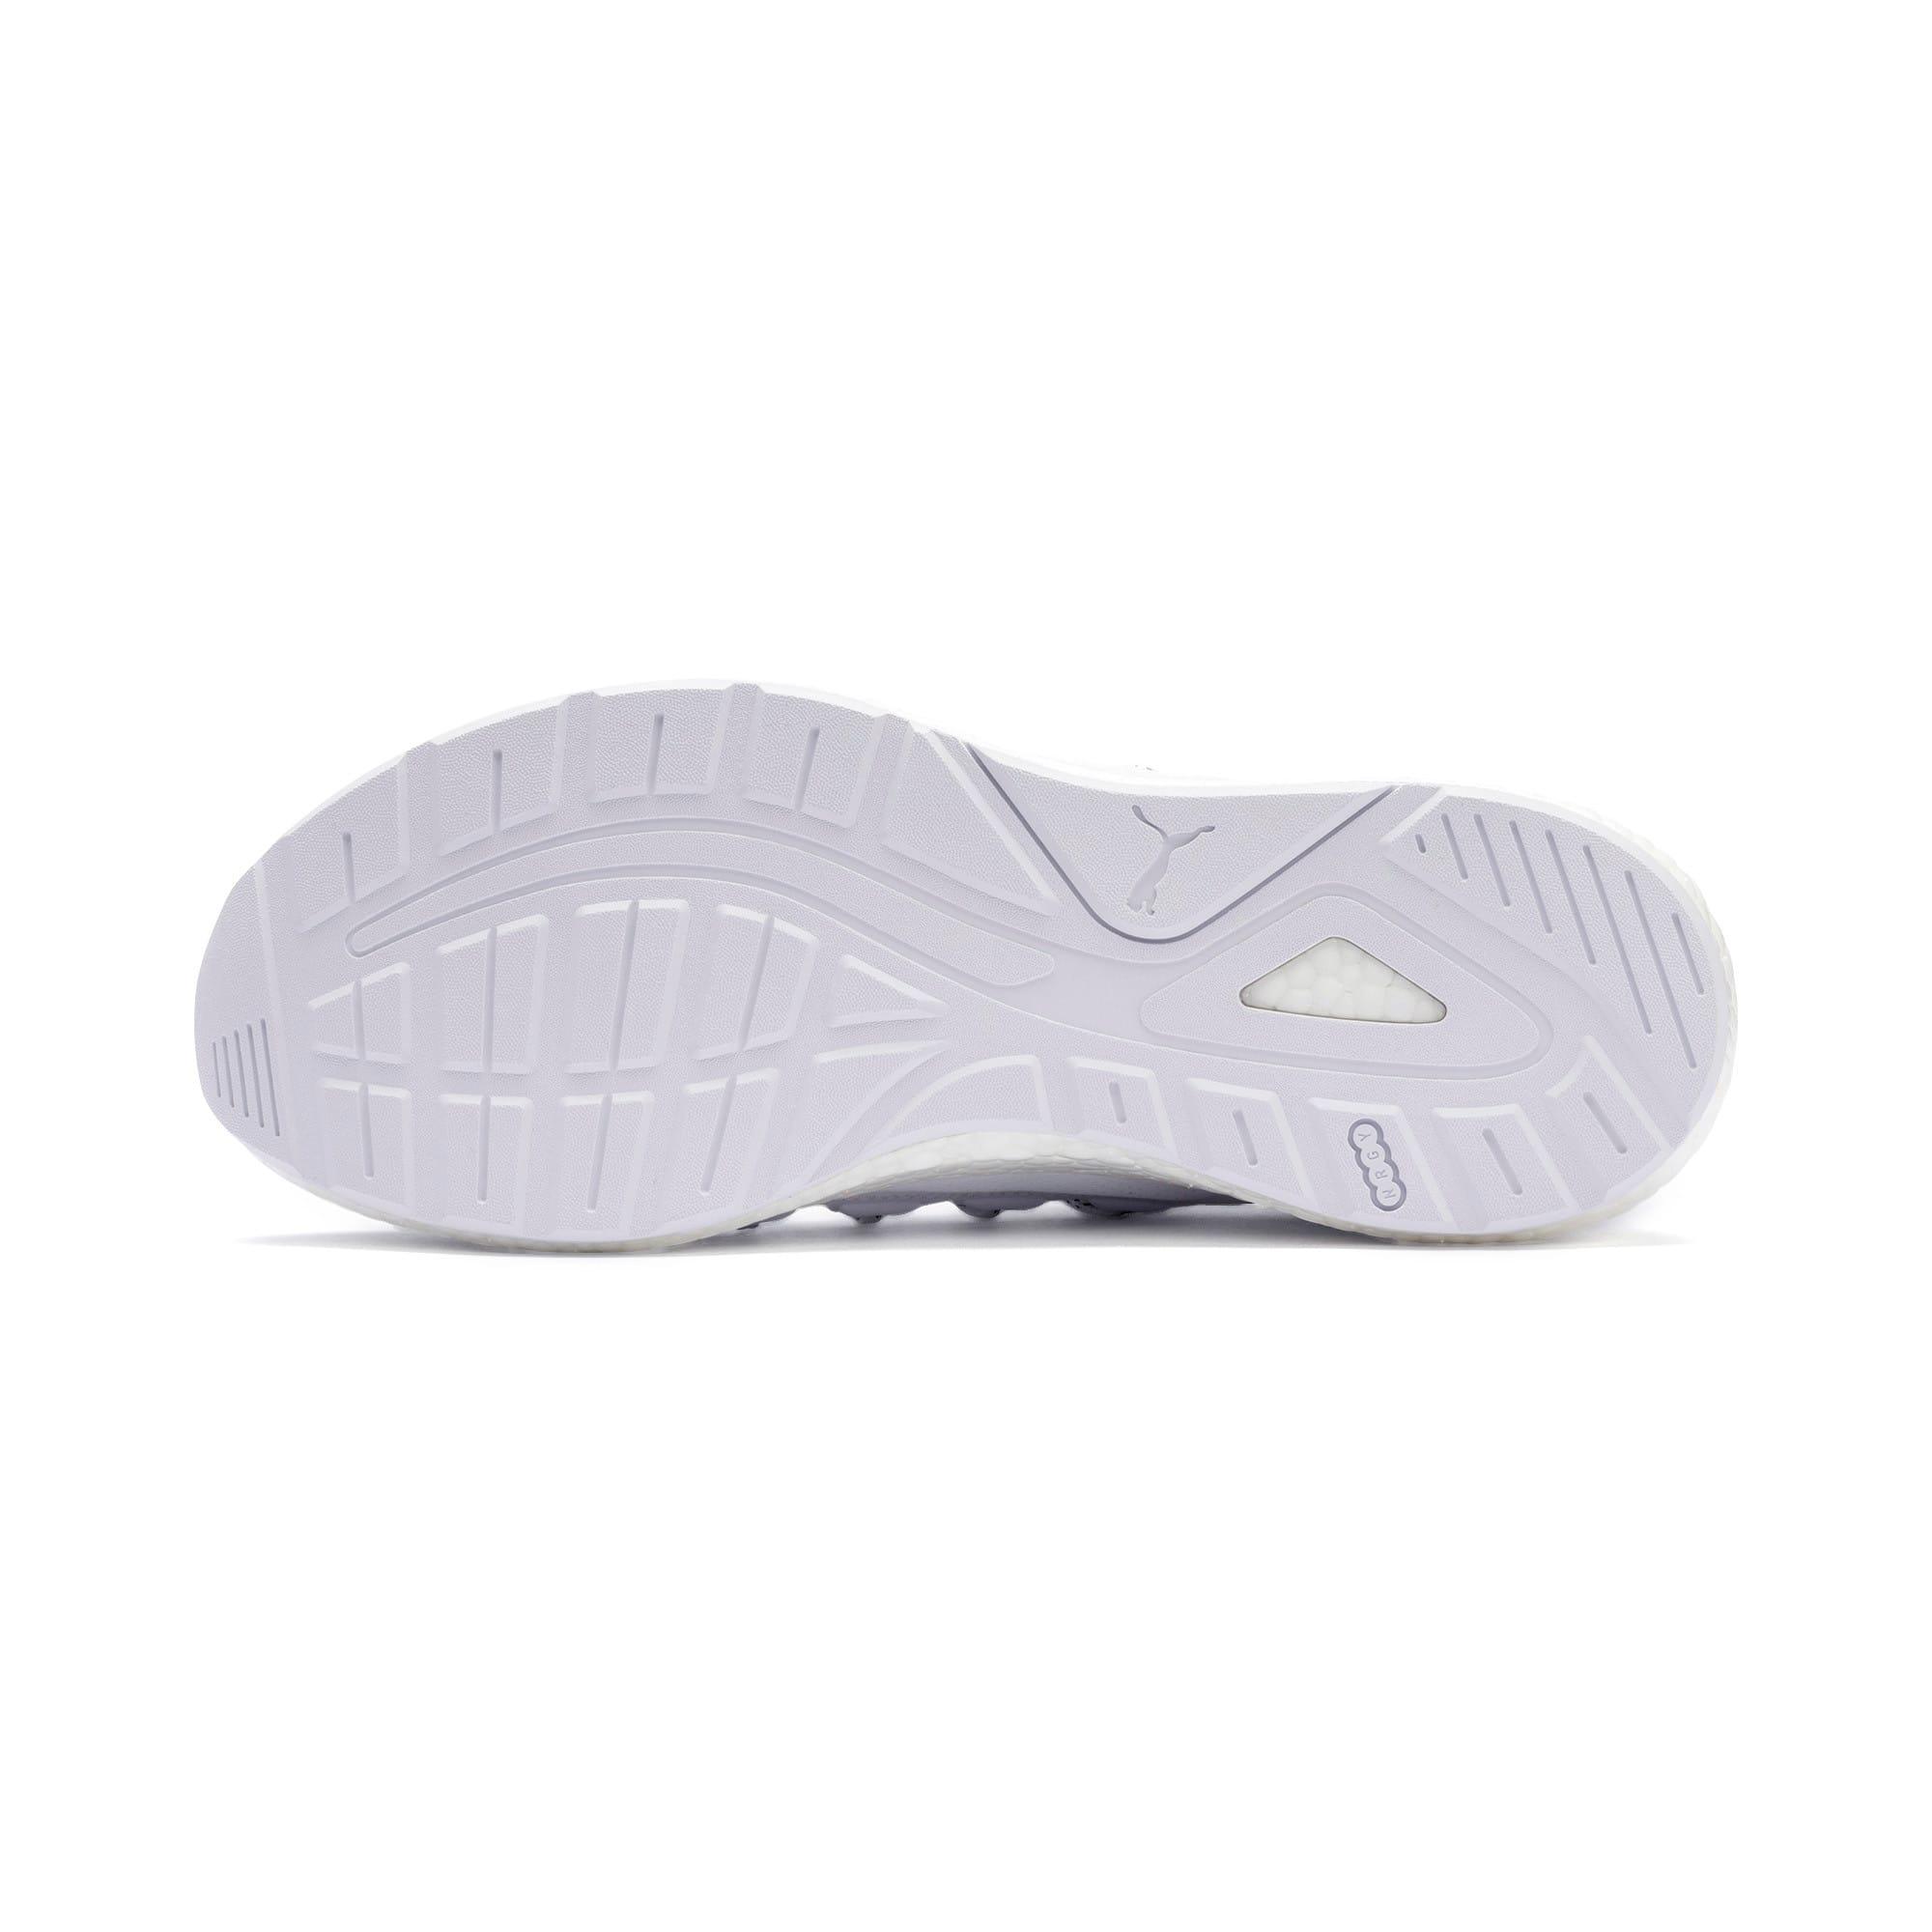 Thumbnail 5 van NRGY Neko Lights hardloopschoenen voor mannen, Puma White, medium